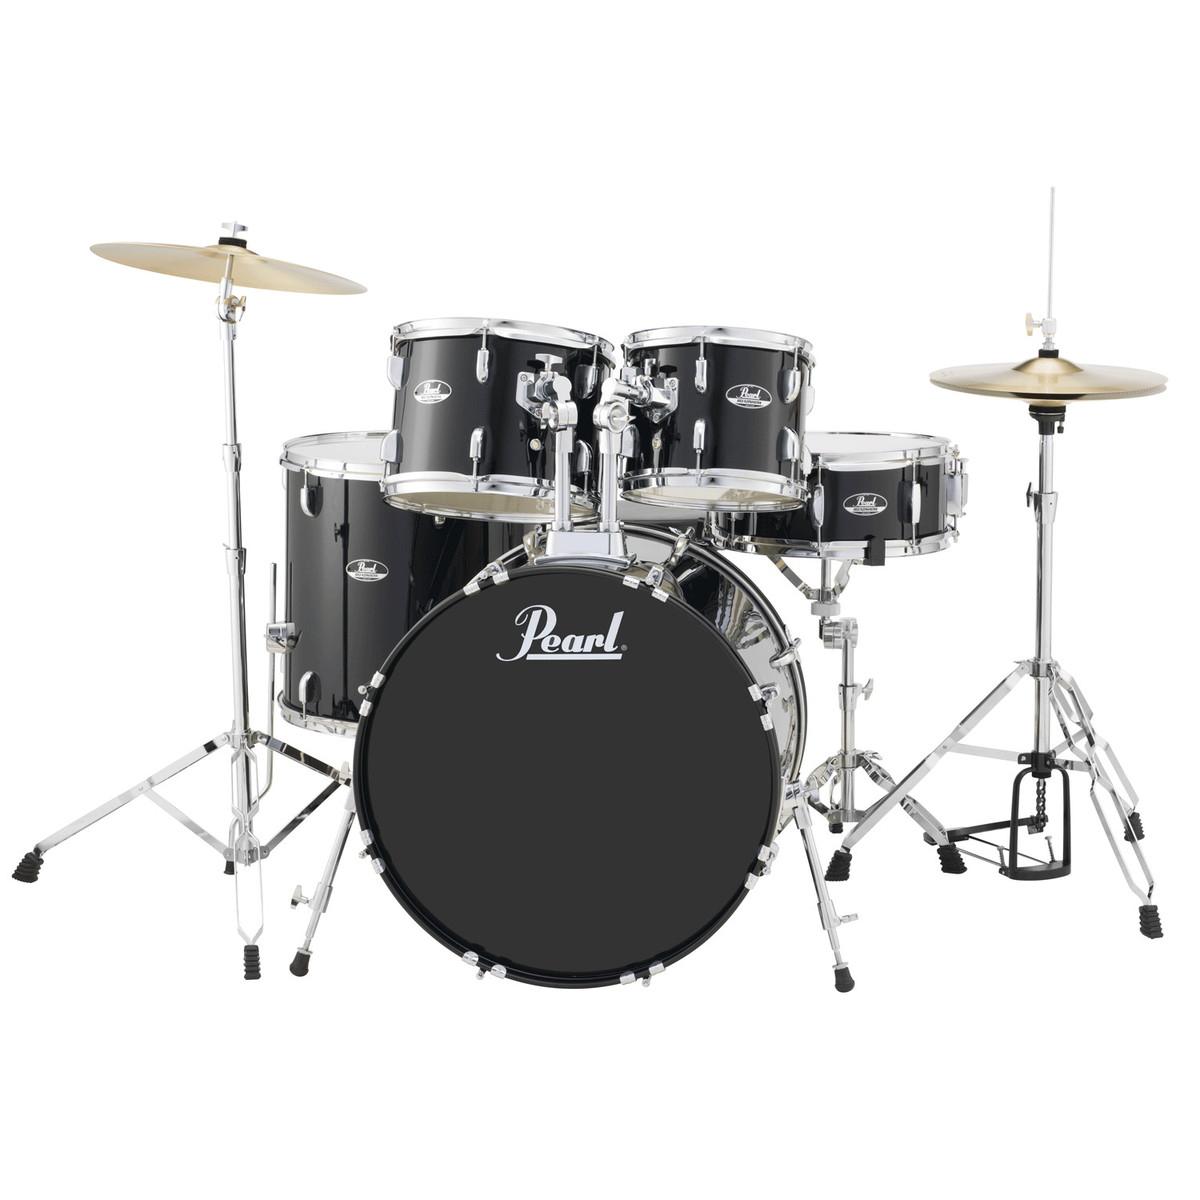 Roadshow Drum Kit Black 18